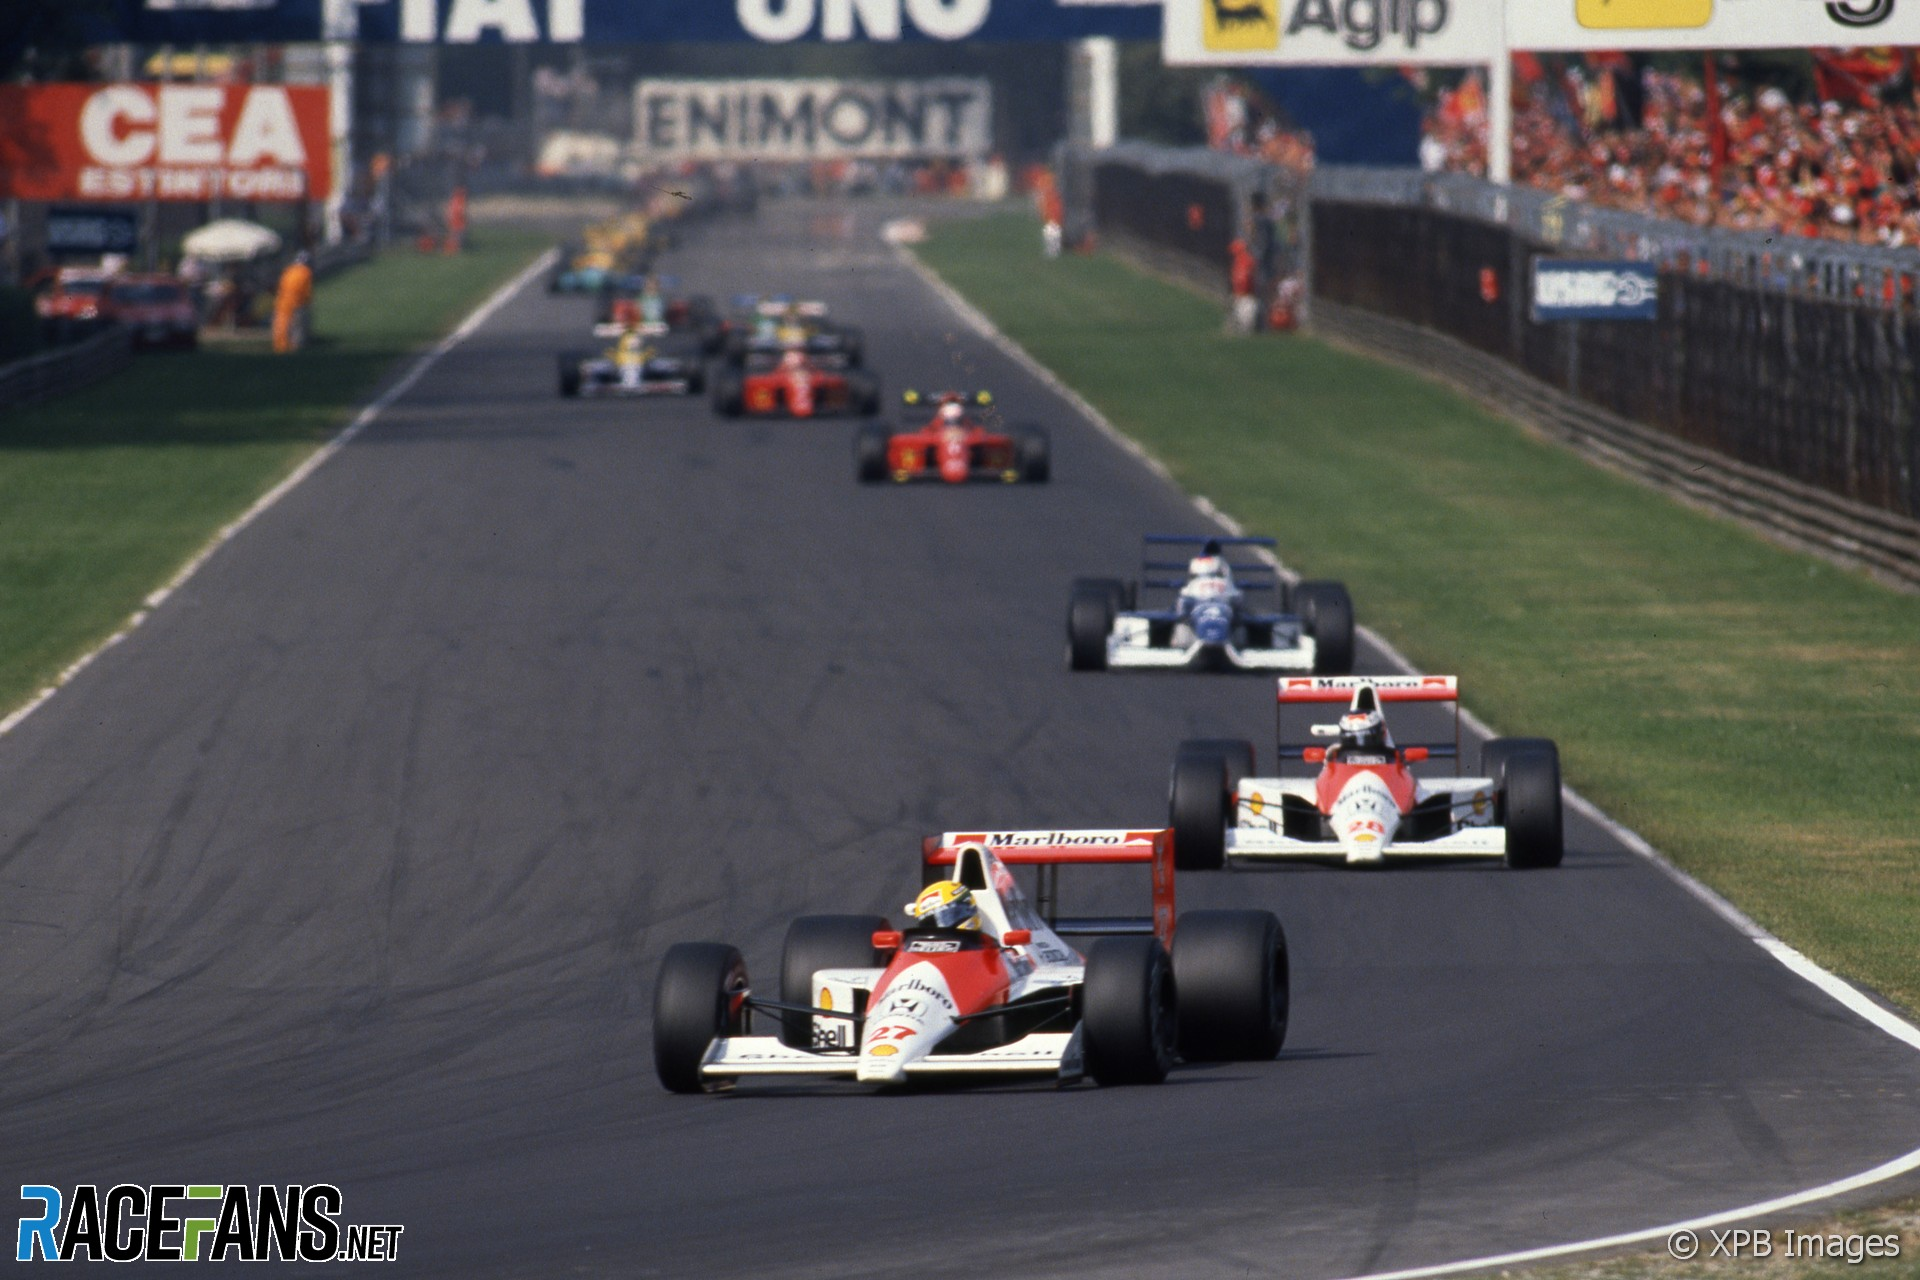 Ayrton Senna, Gerhard Berger, Jean Alesi, Monza, 1990